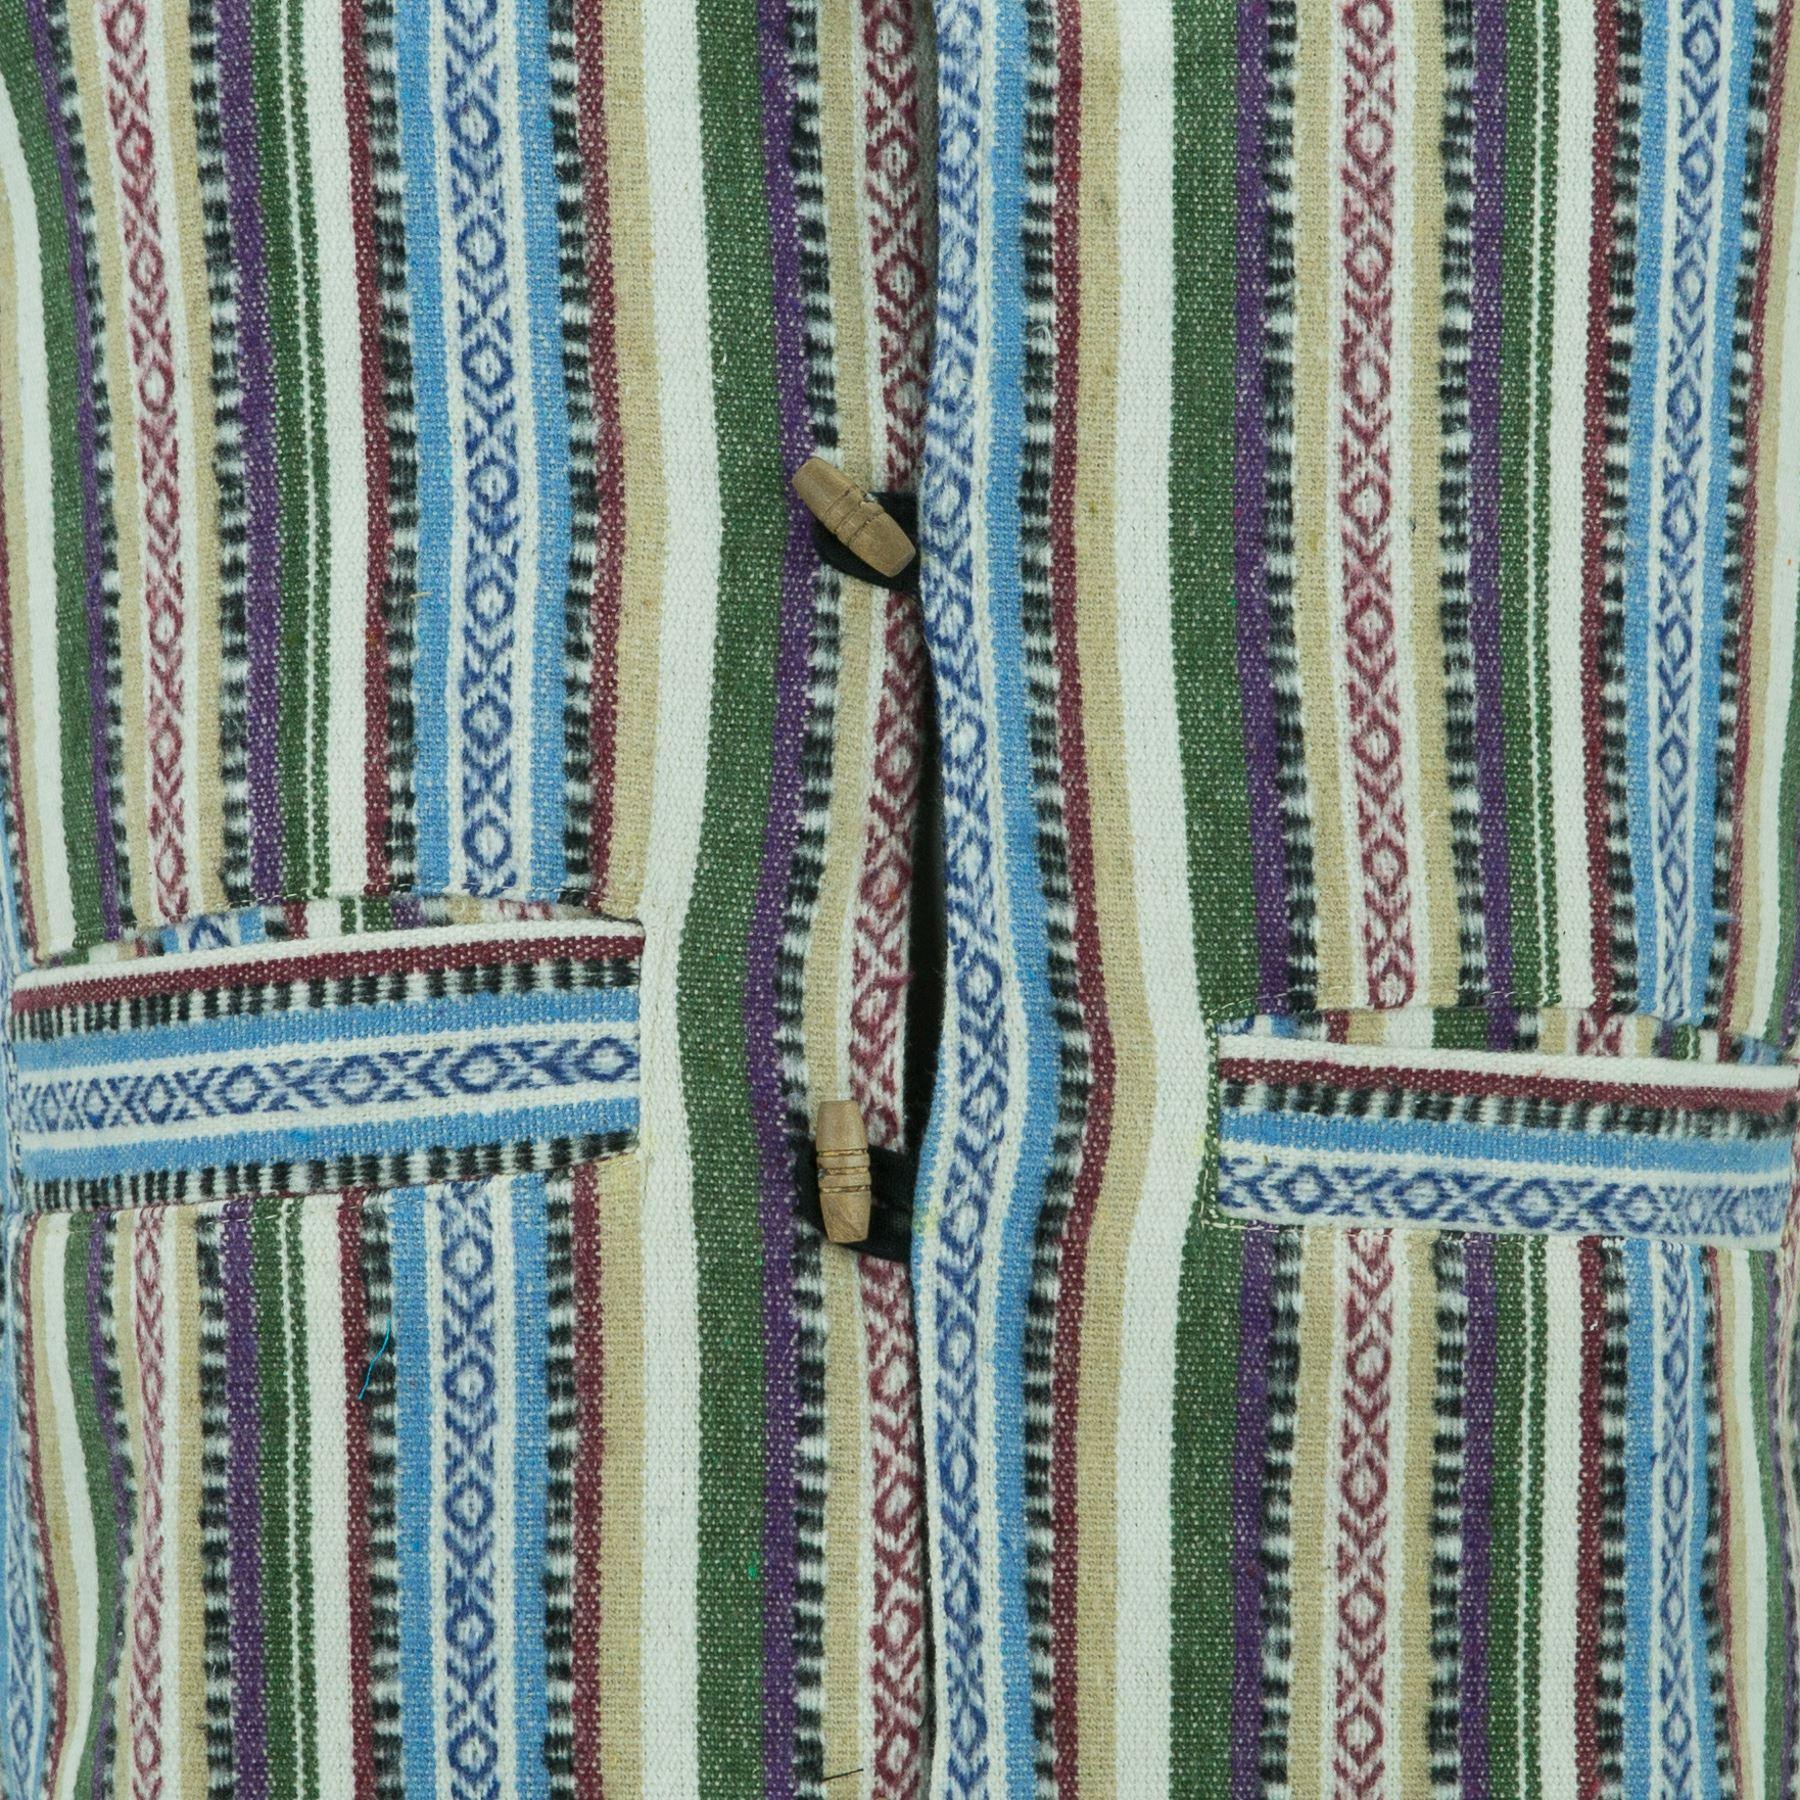 Chaleco-Algodon-Hombre-Perchado-Hippie-Boho-Traje-para-Hombre-Mujer miniatura 6